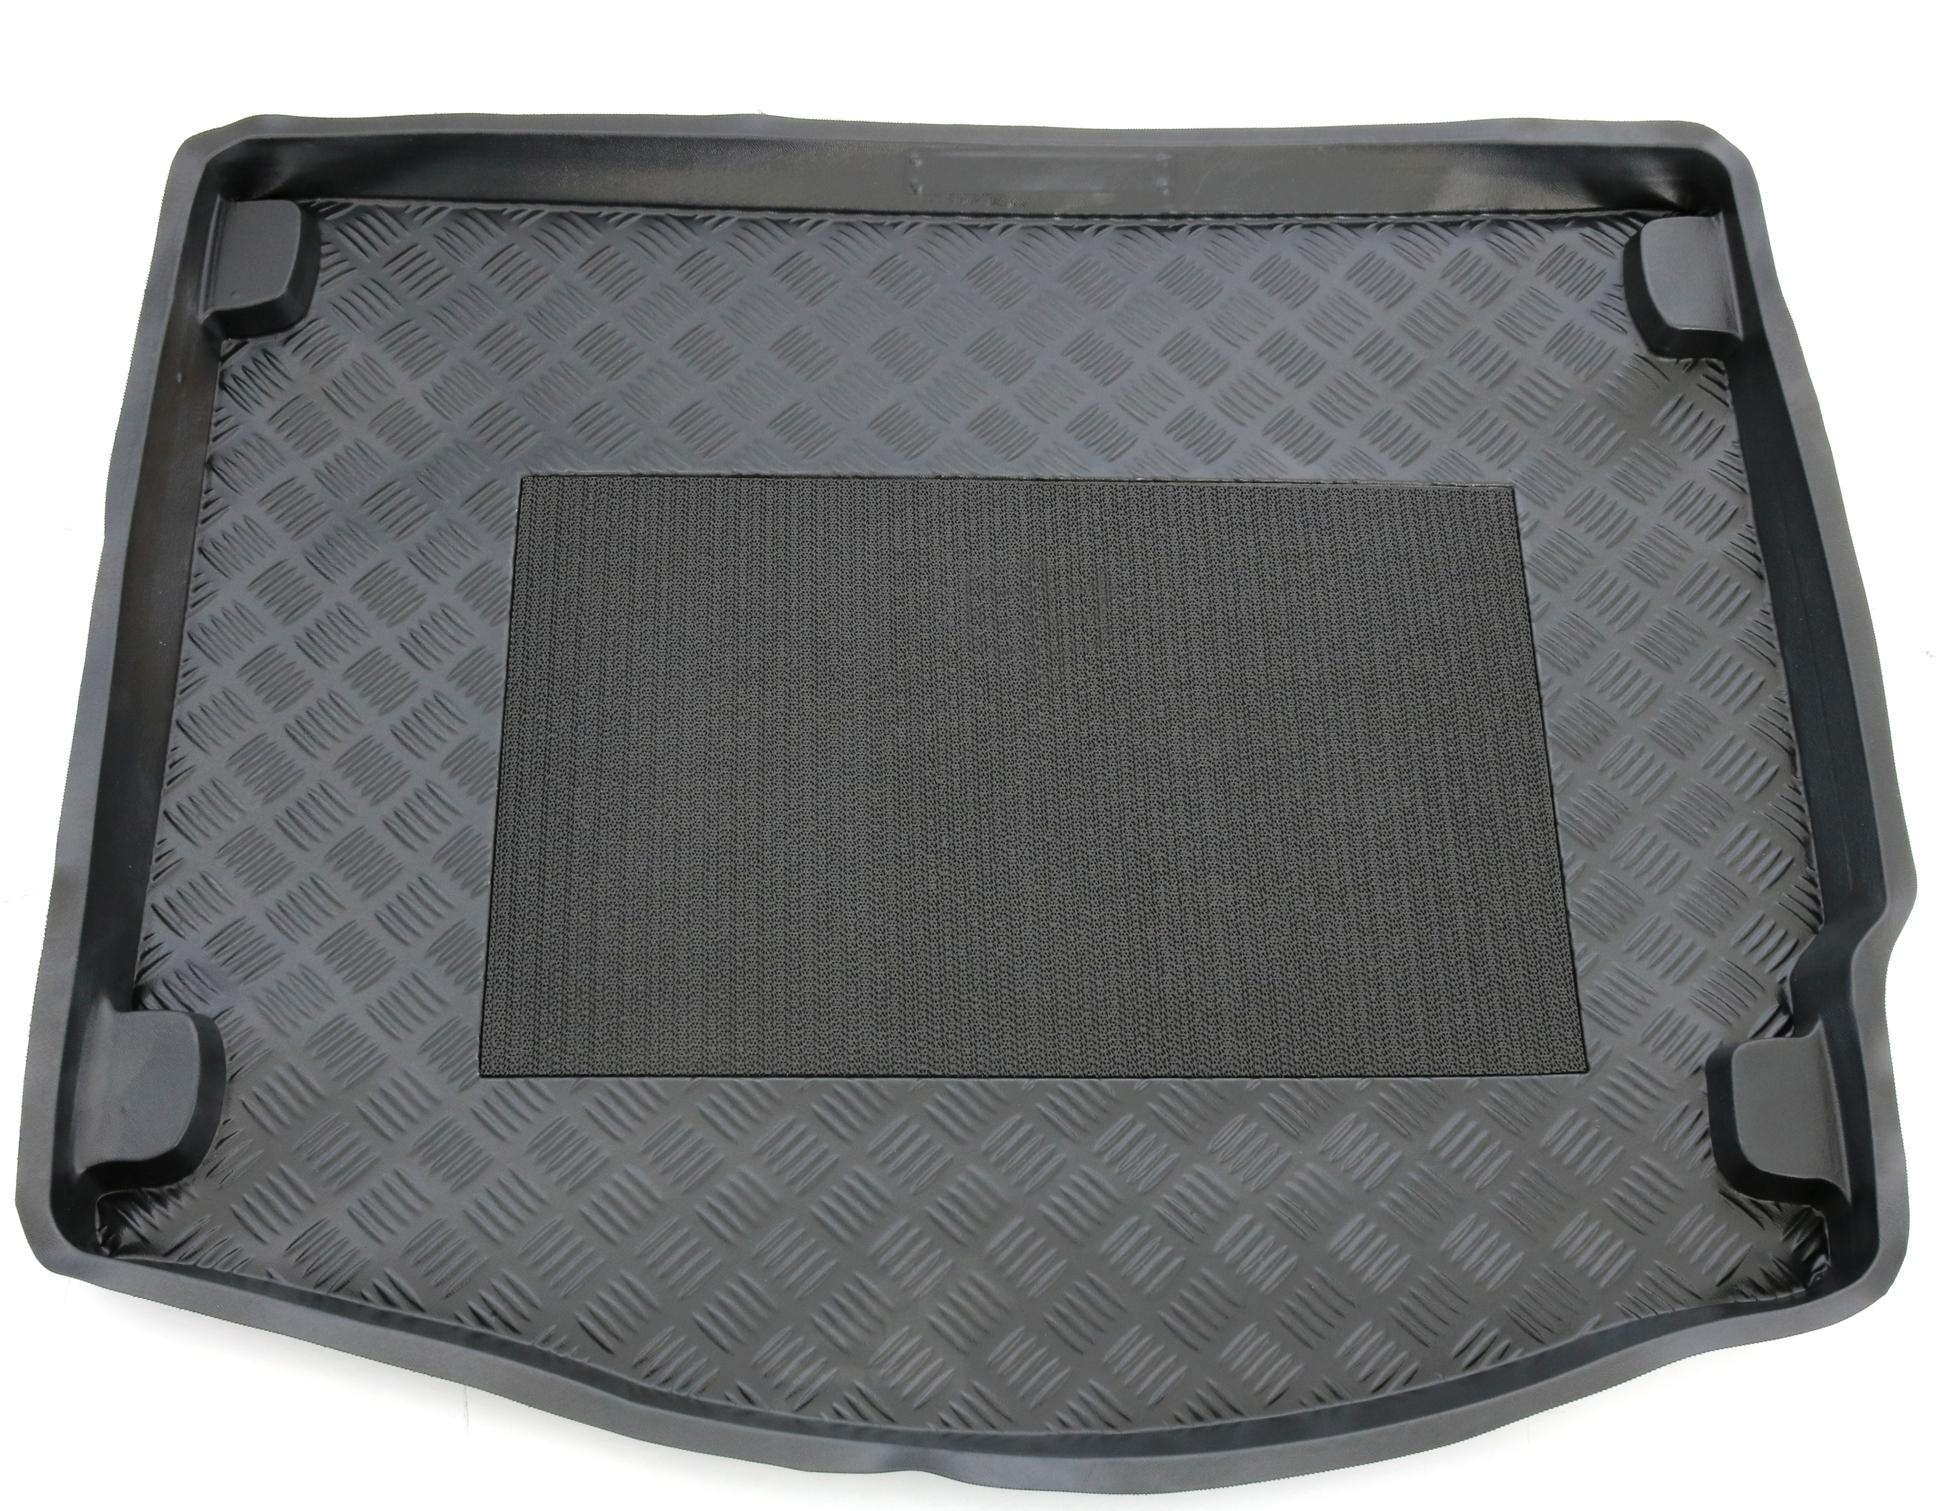 kofferraumwanne f r ford focus mk3 kofferraummatte. Black Bedroom Furniture Sets. Home Design Ideas